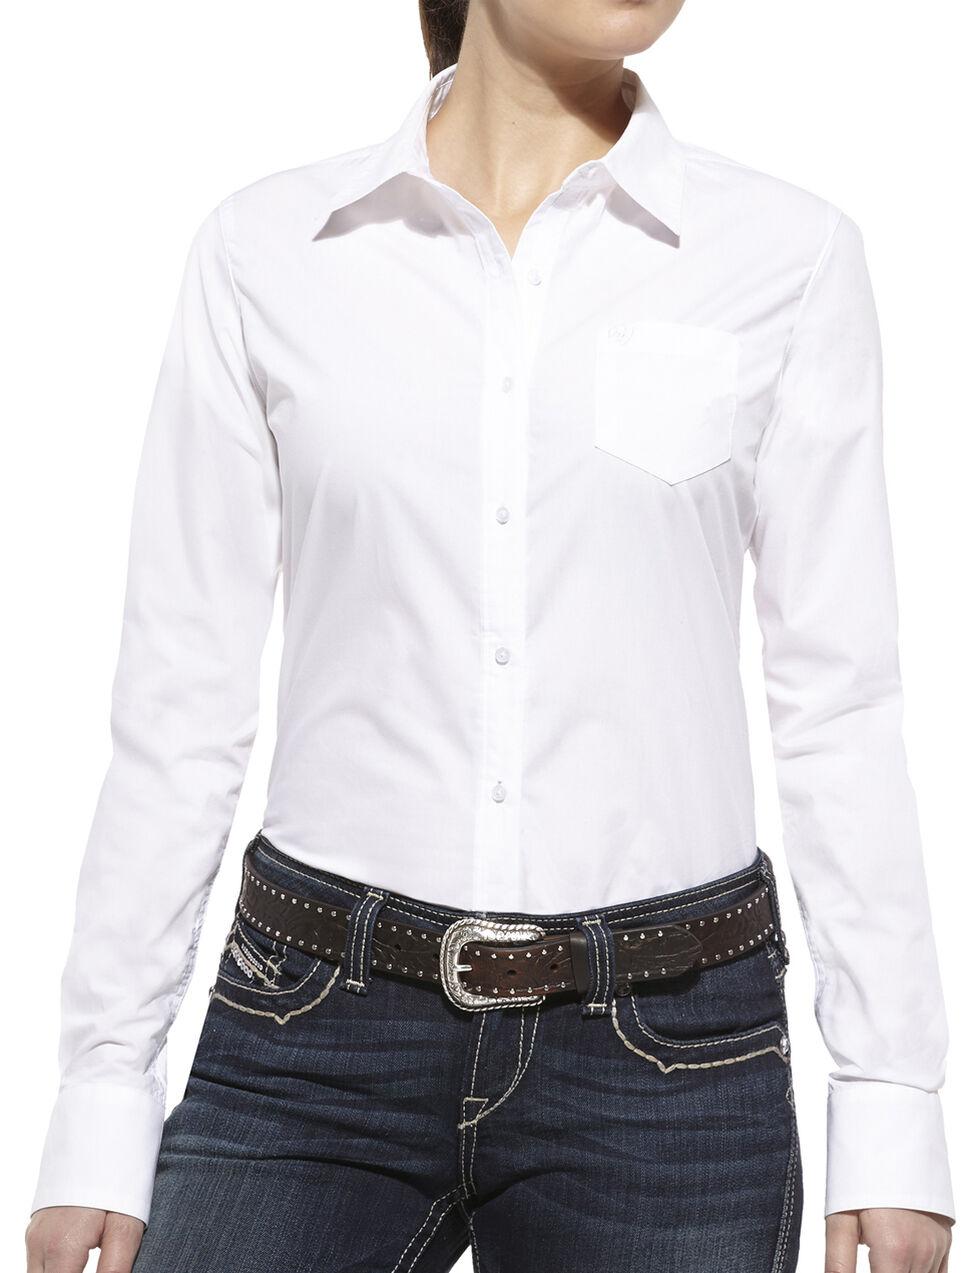 Ariat Women's Kirby Long Sleeve Shirt, White, hi-res